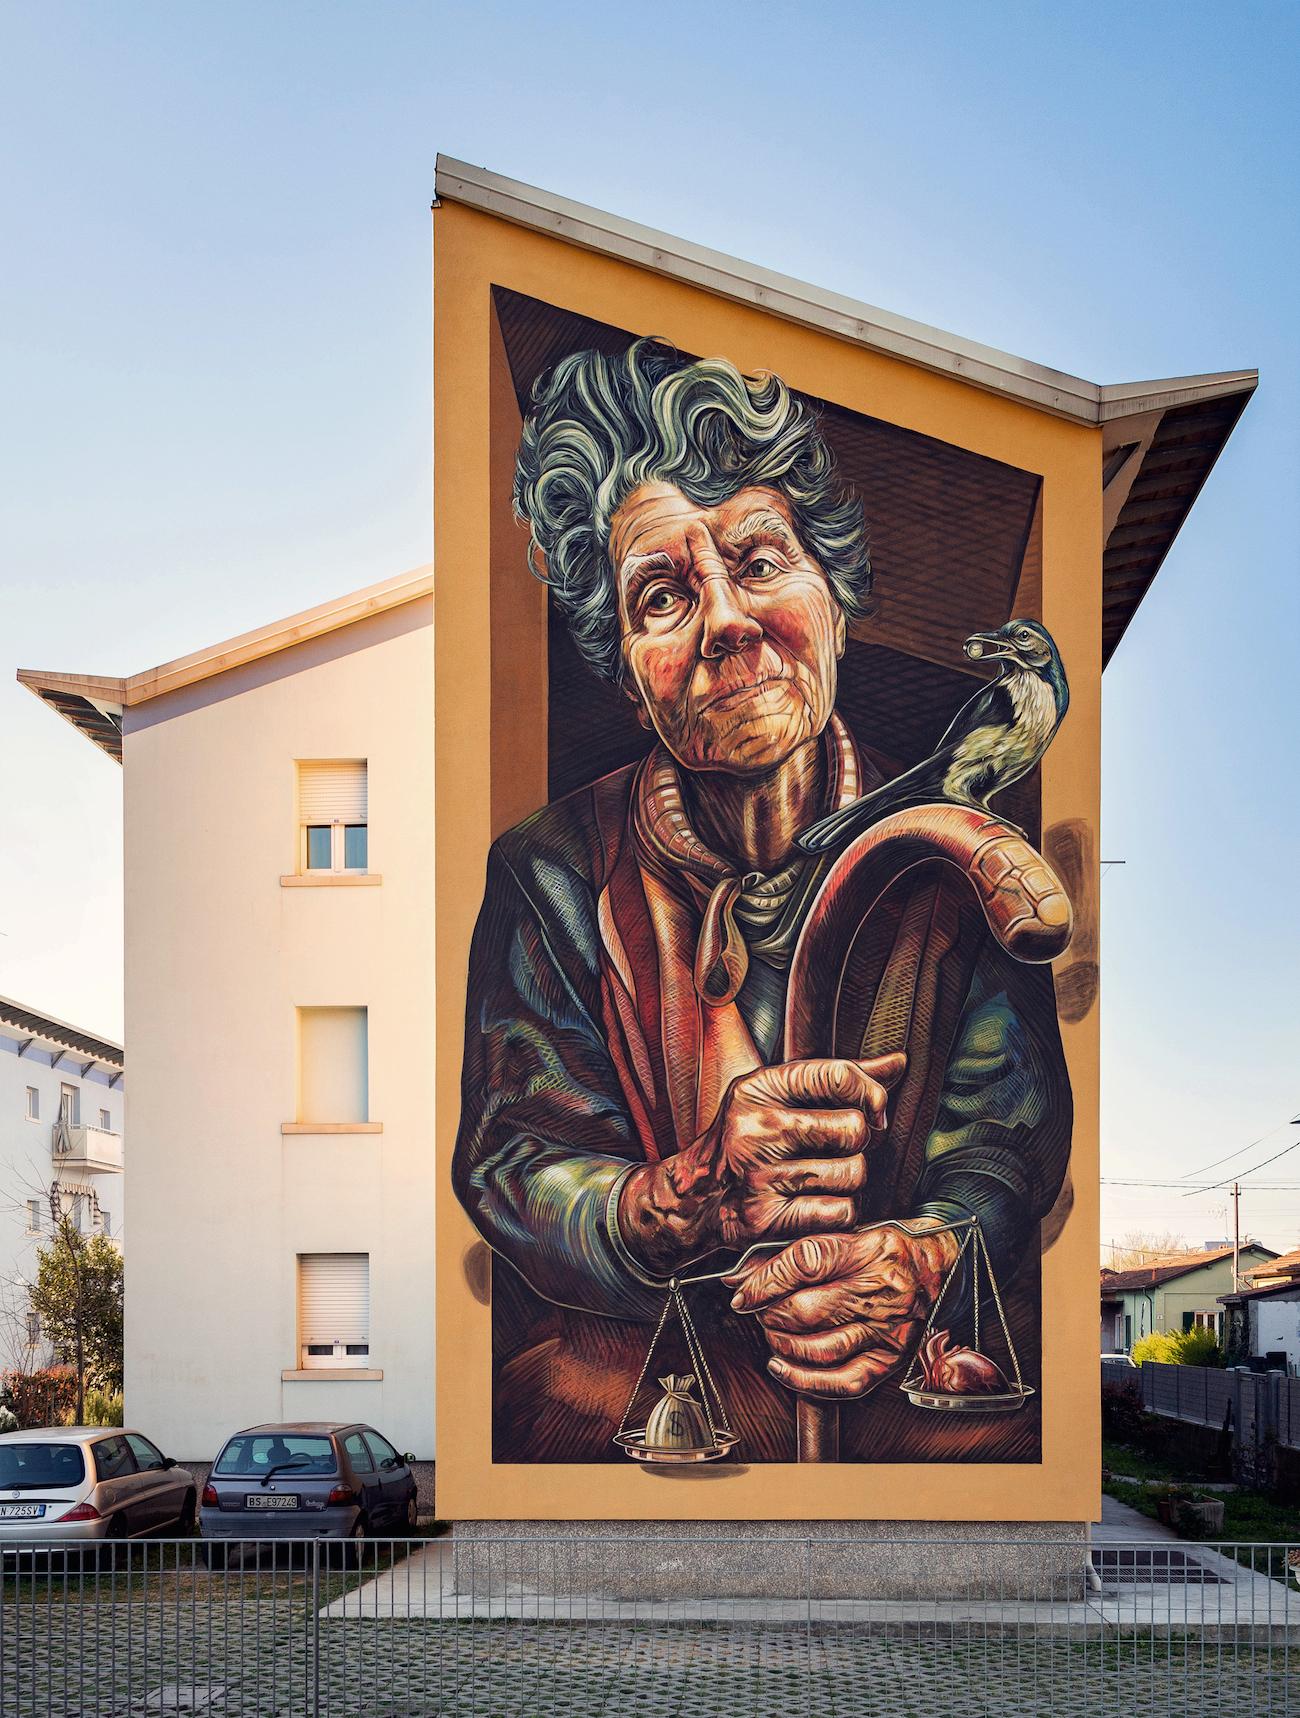 verabugatti streetart murals walls arteurbana illusioniottiche 3Dstreetart autaut psicostasia pesaturadelcuore ghiandaia restiamoumani